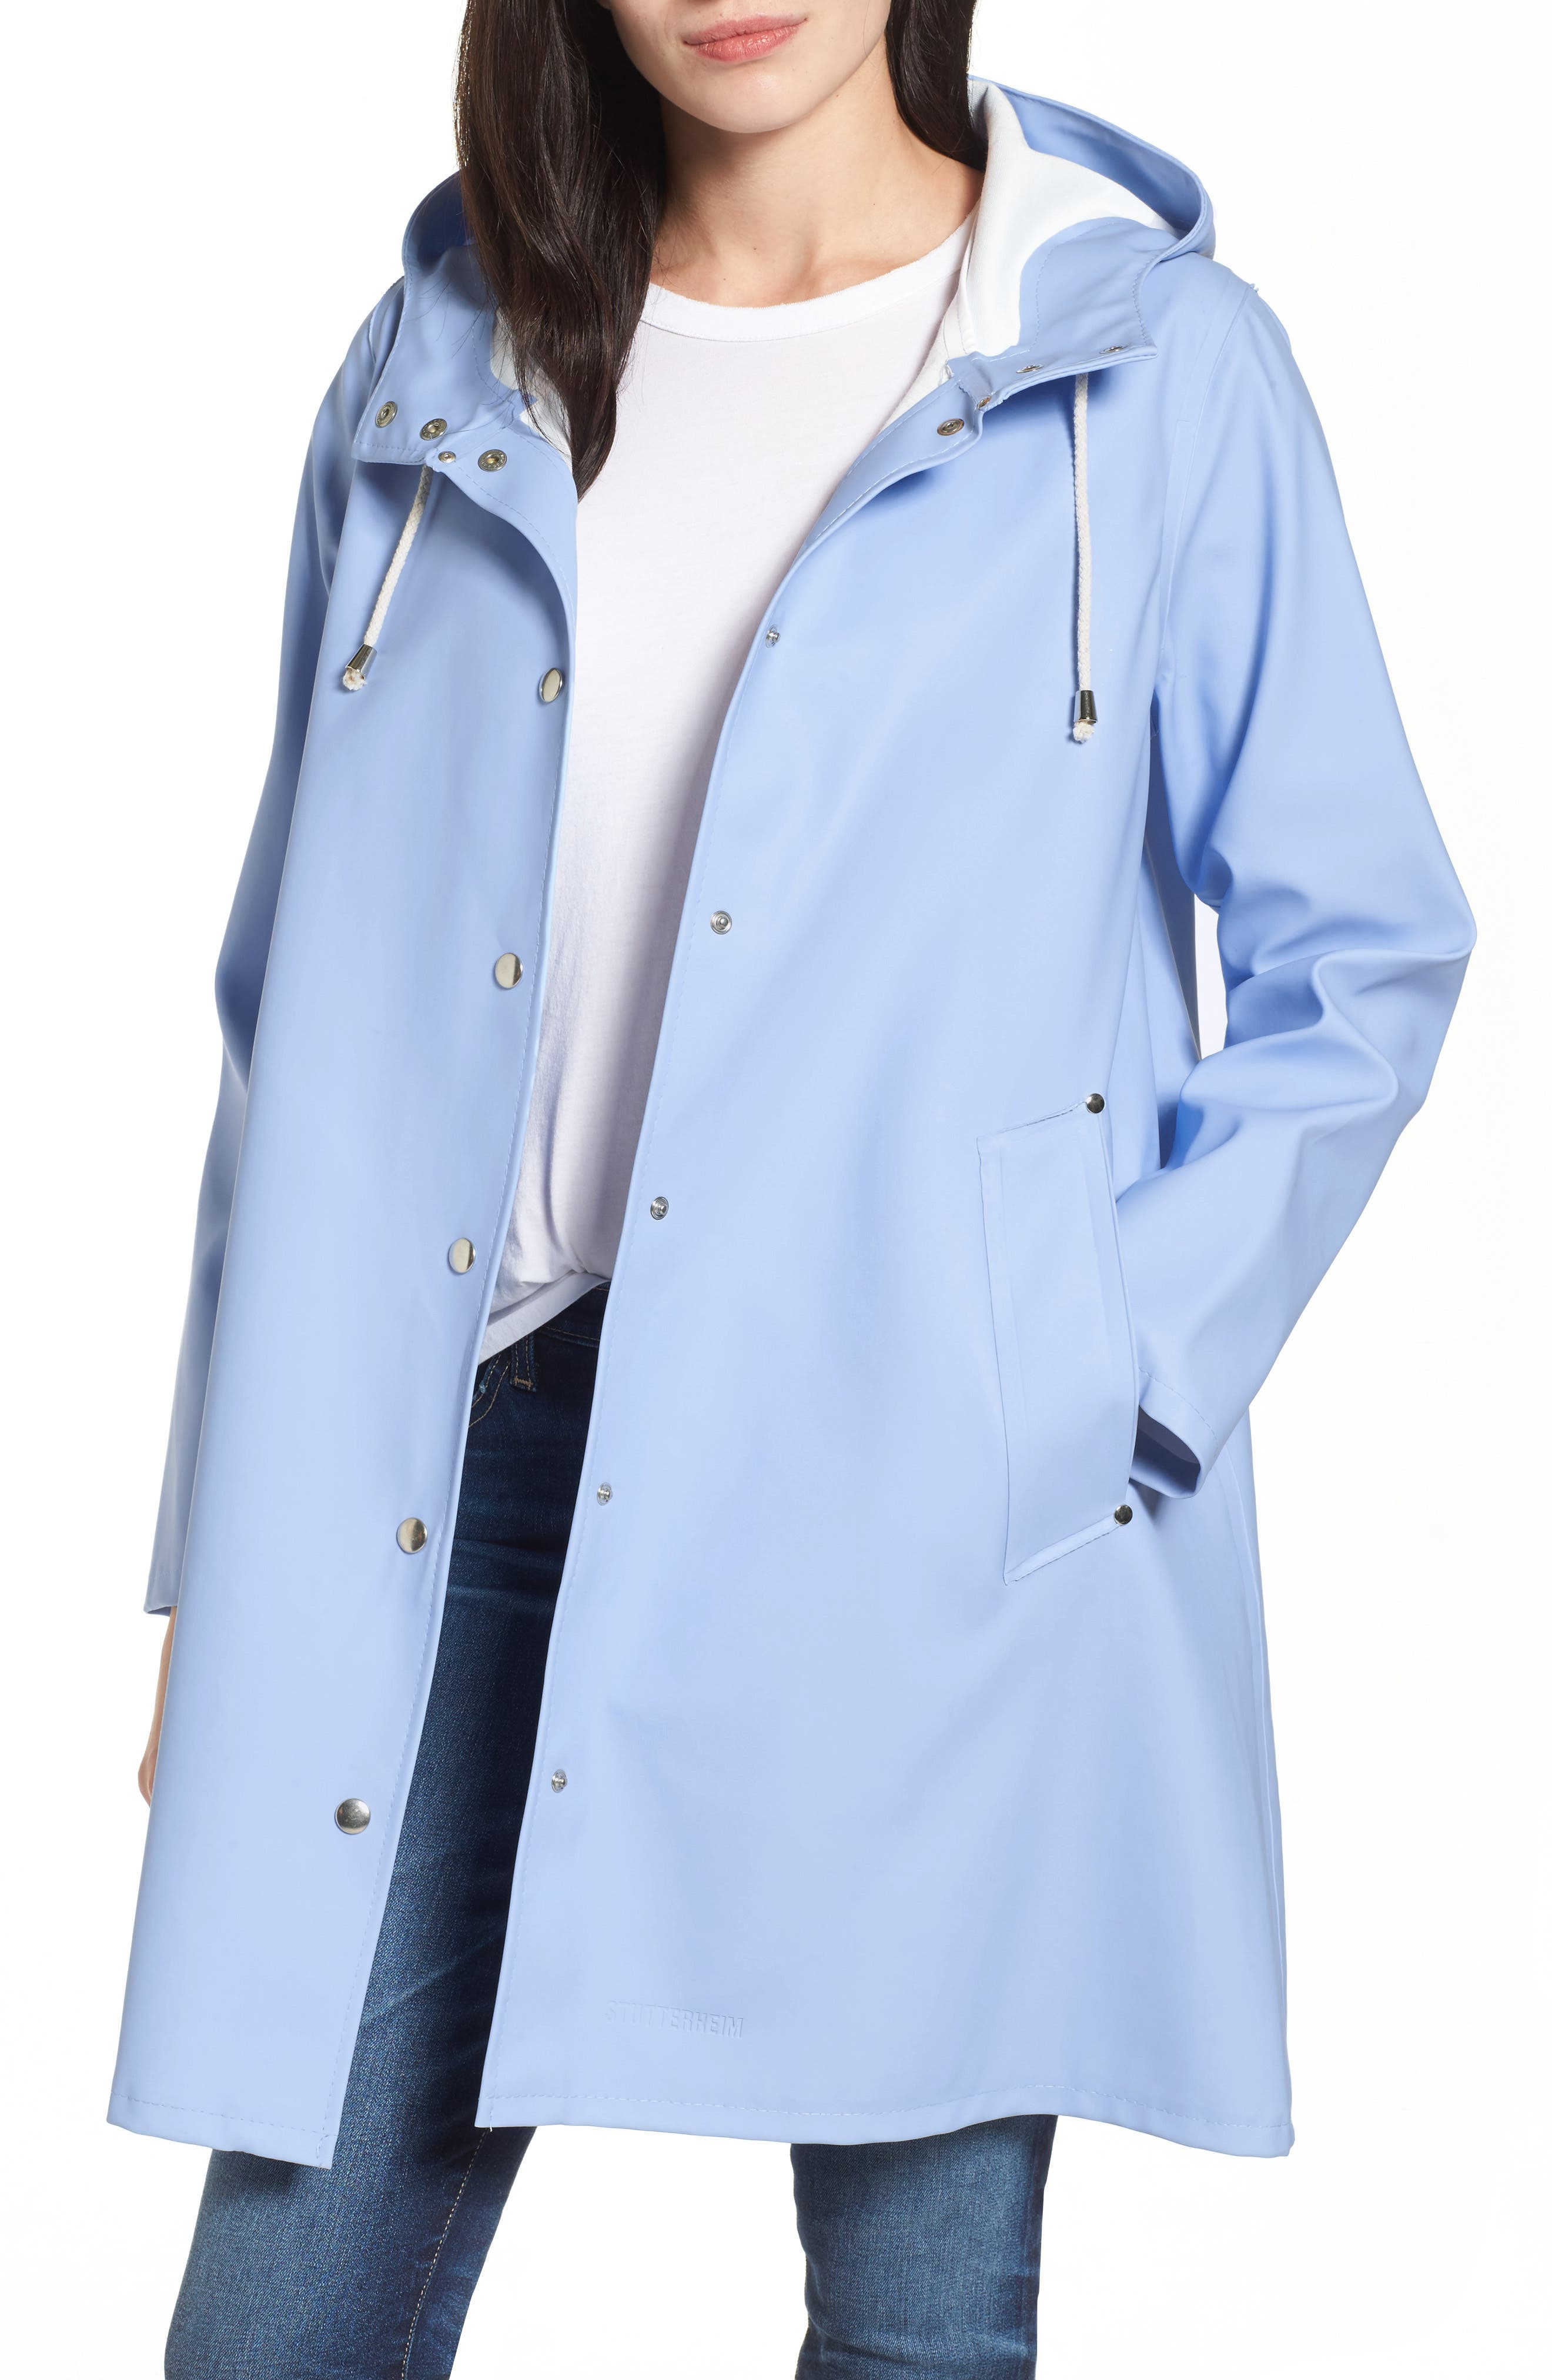 Alternate Image 1 Selected - Stutterheim Mosebacke Waterproof A-Line Hooded Raincoat